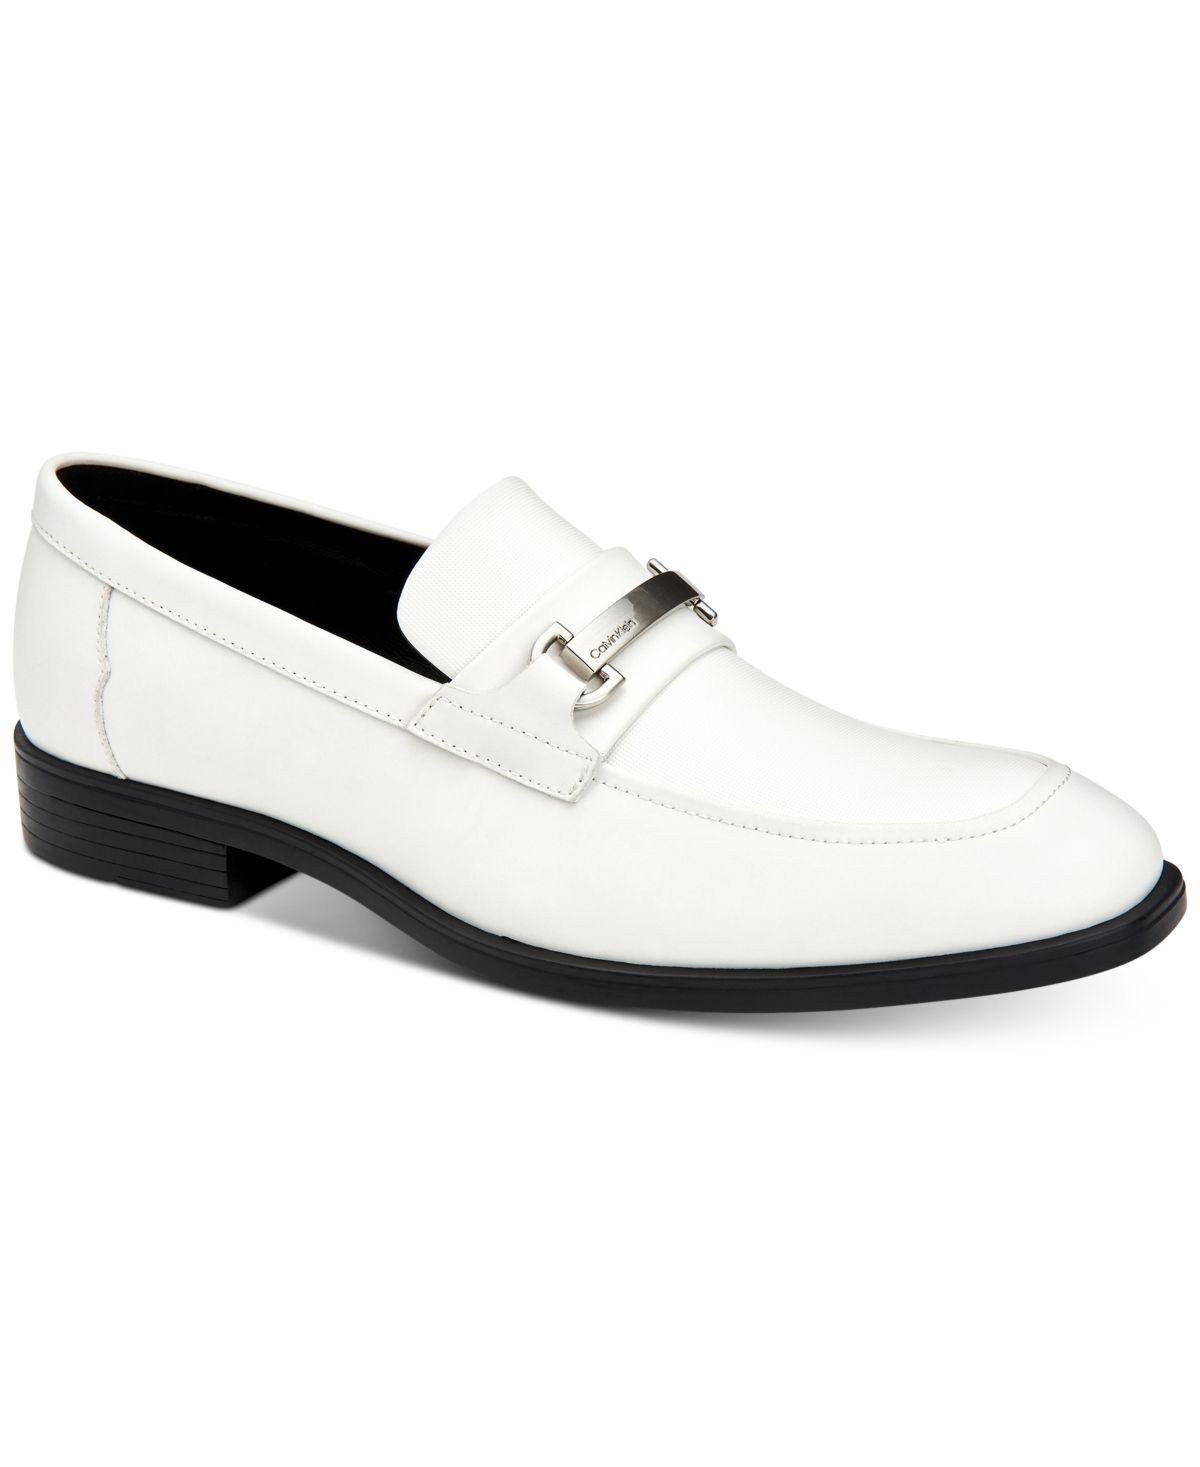 Loafers men, Mens dress loafers